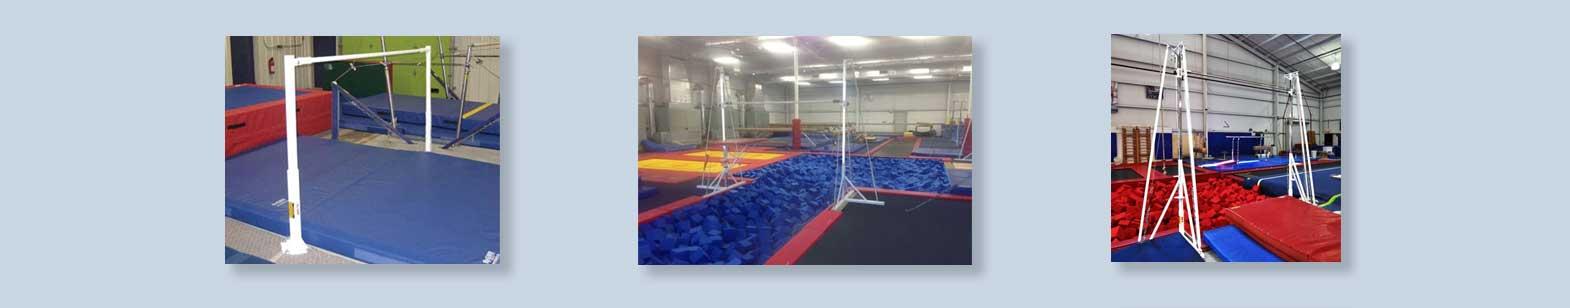 Gymnastics Single Bar Trainer